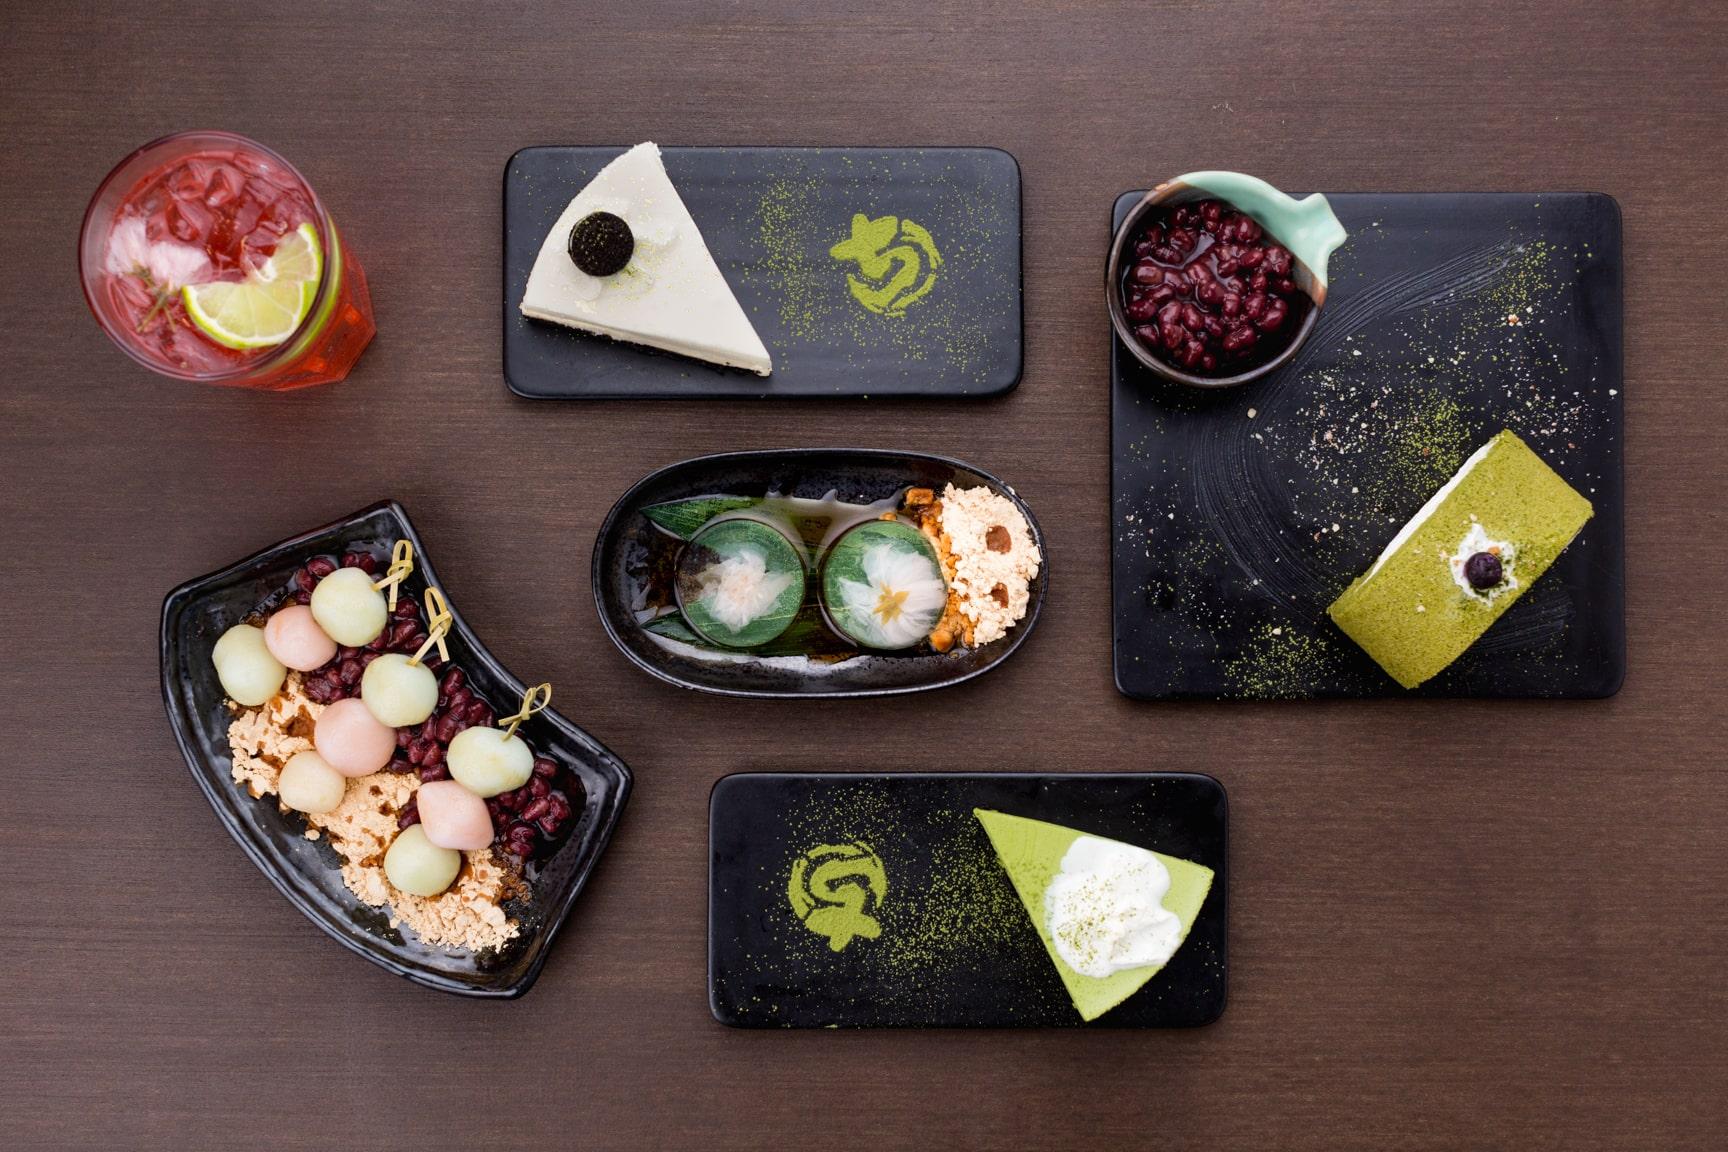 Chimoto Japanese Desserts Phototgraphy by Marlboro Wang for Focal bookfocal.com